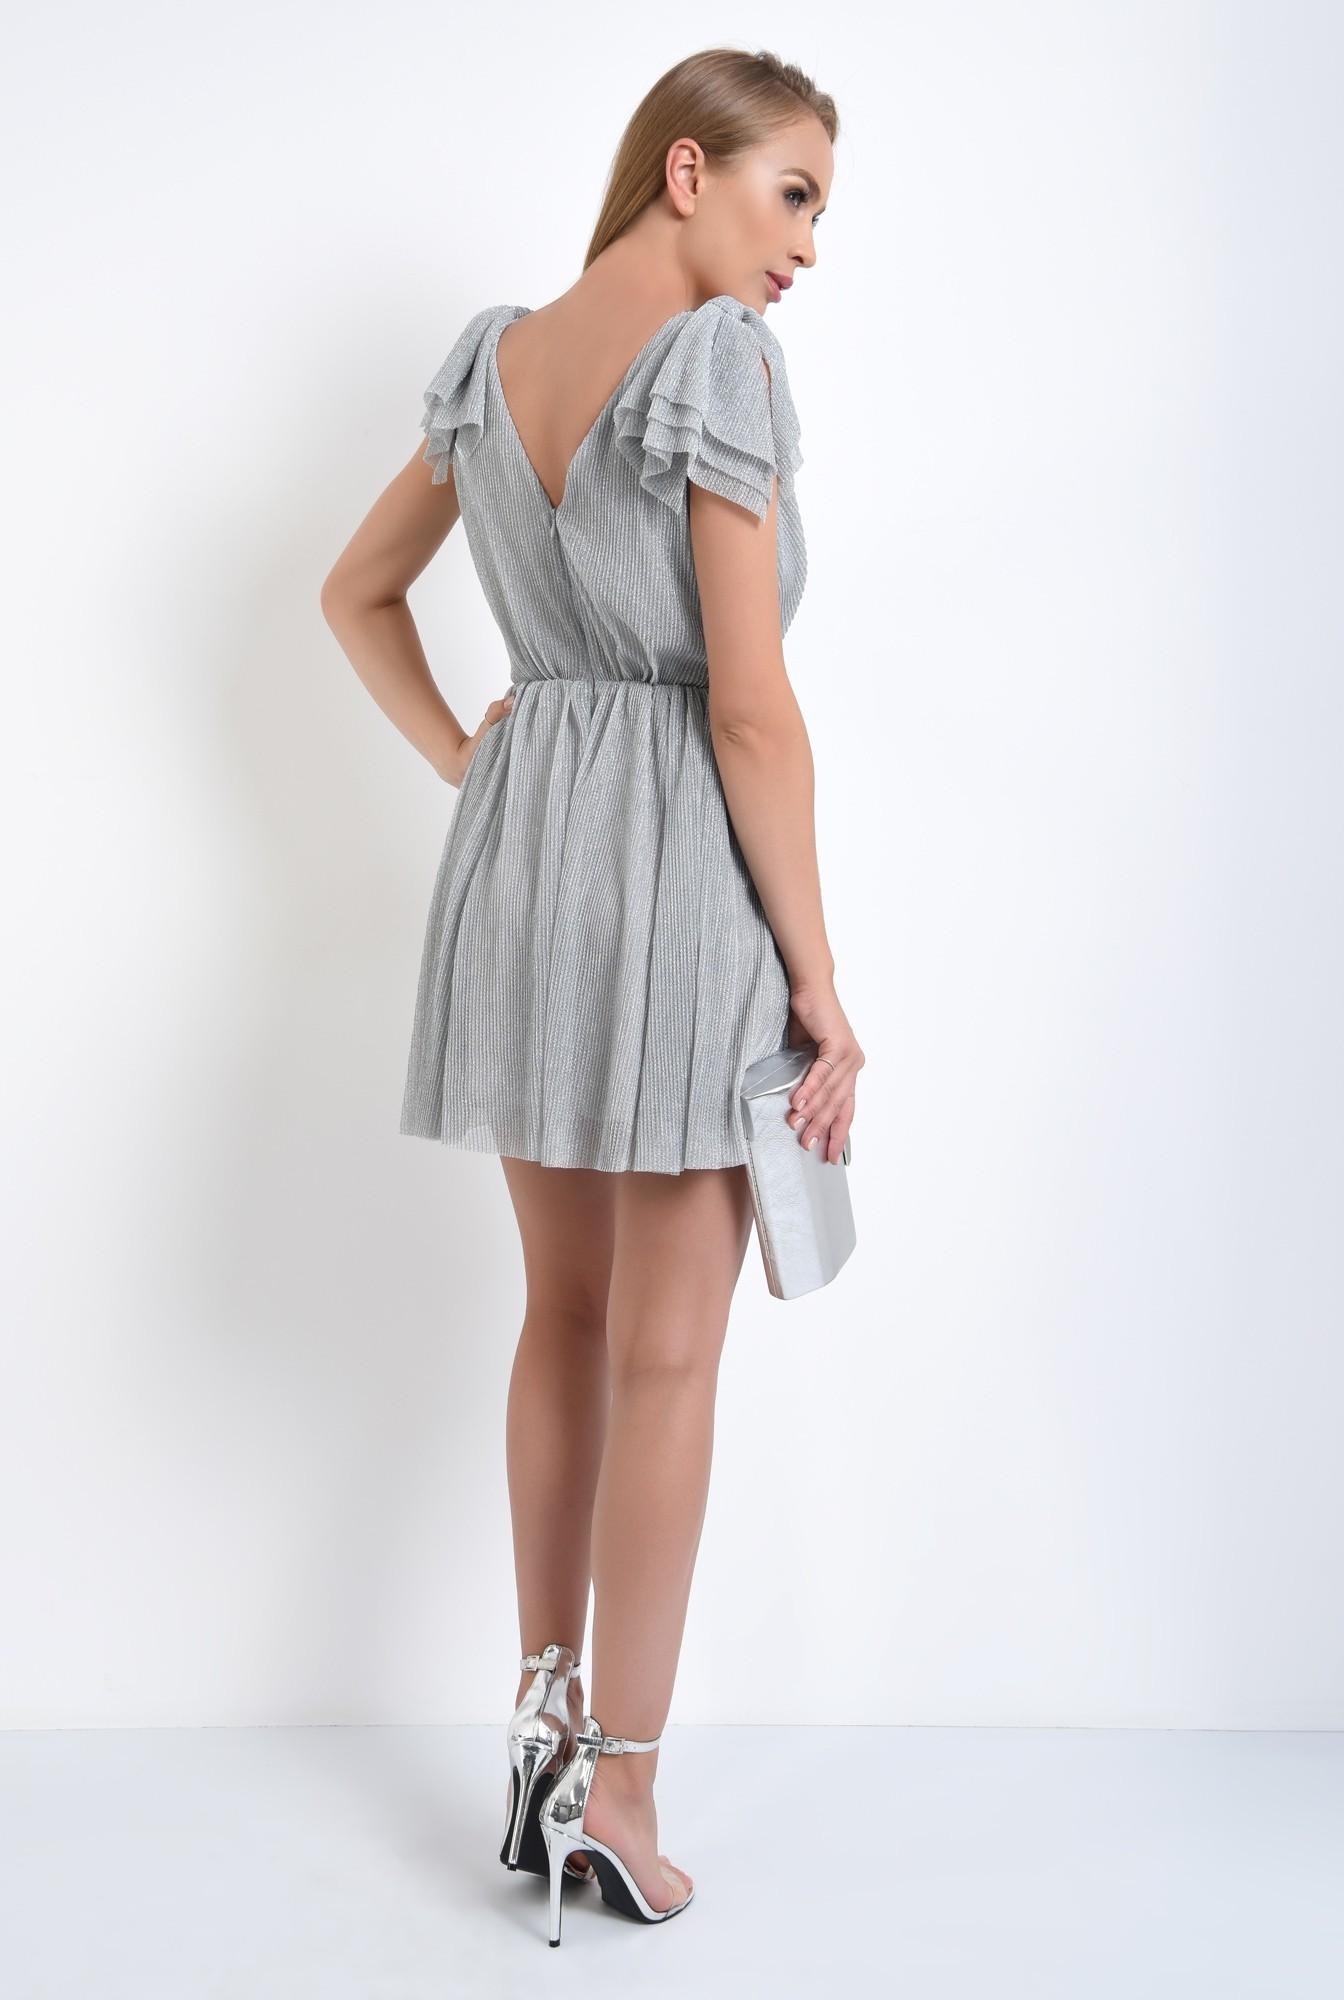 1 - rochie de ocazie, lurex, argintiu, funde la umeri, lungime mini